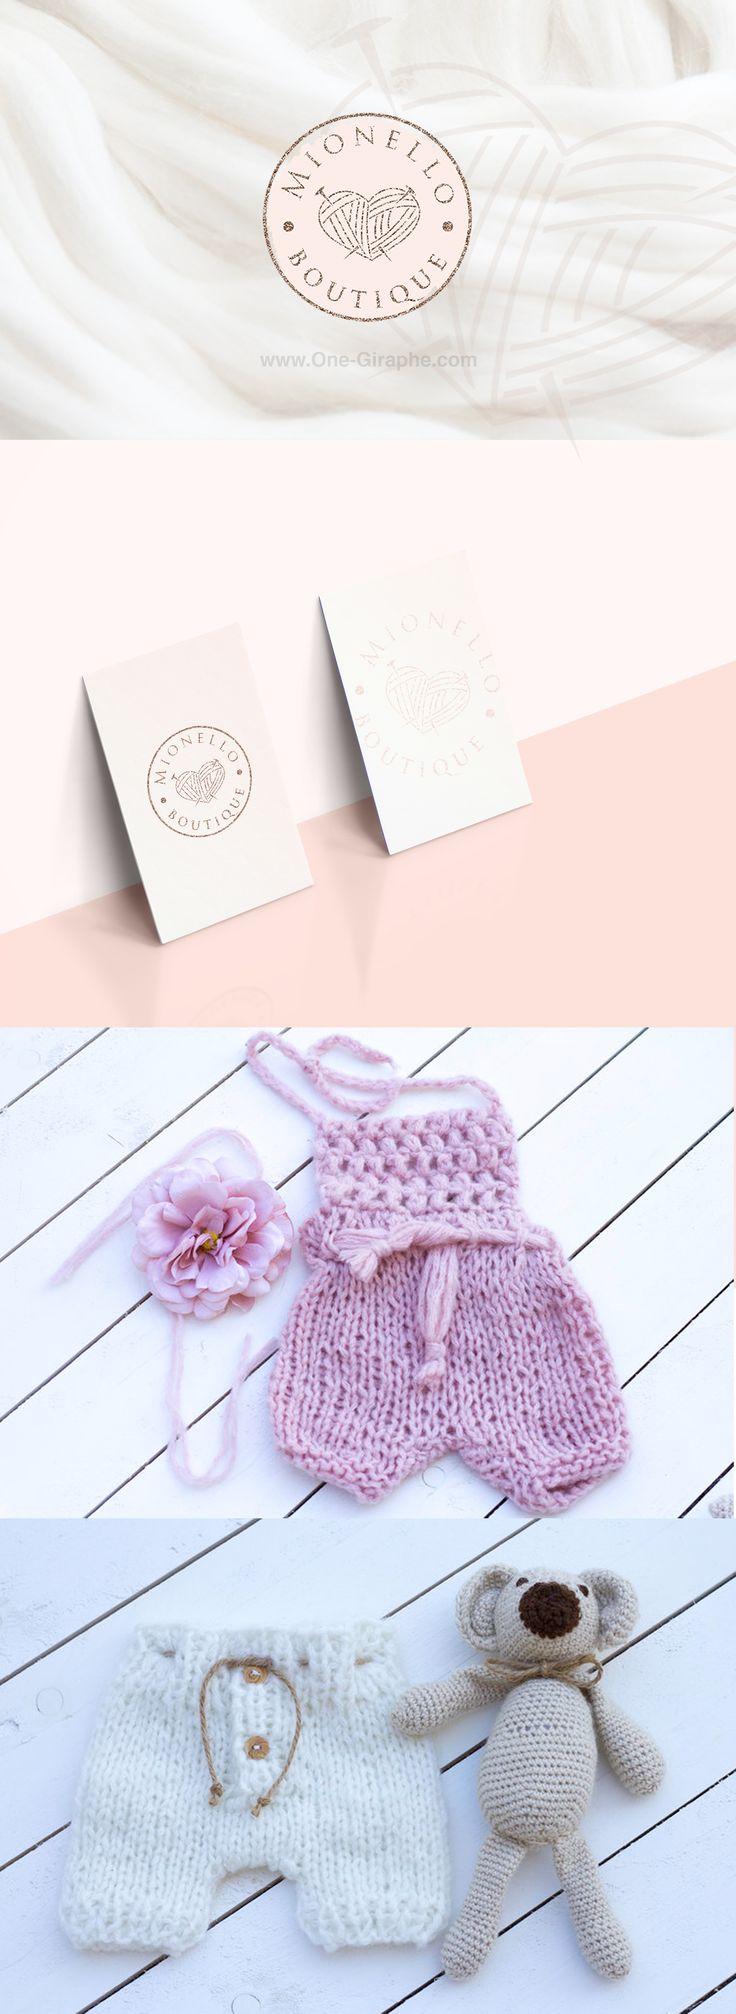 Brand Identity for Handmade Kids  Clothing #handmade #cloth #baby #kids #brandidetity #behance #etsy #designer #logo #cute #wool #logos #logodesign